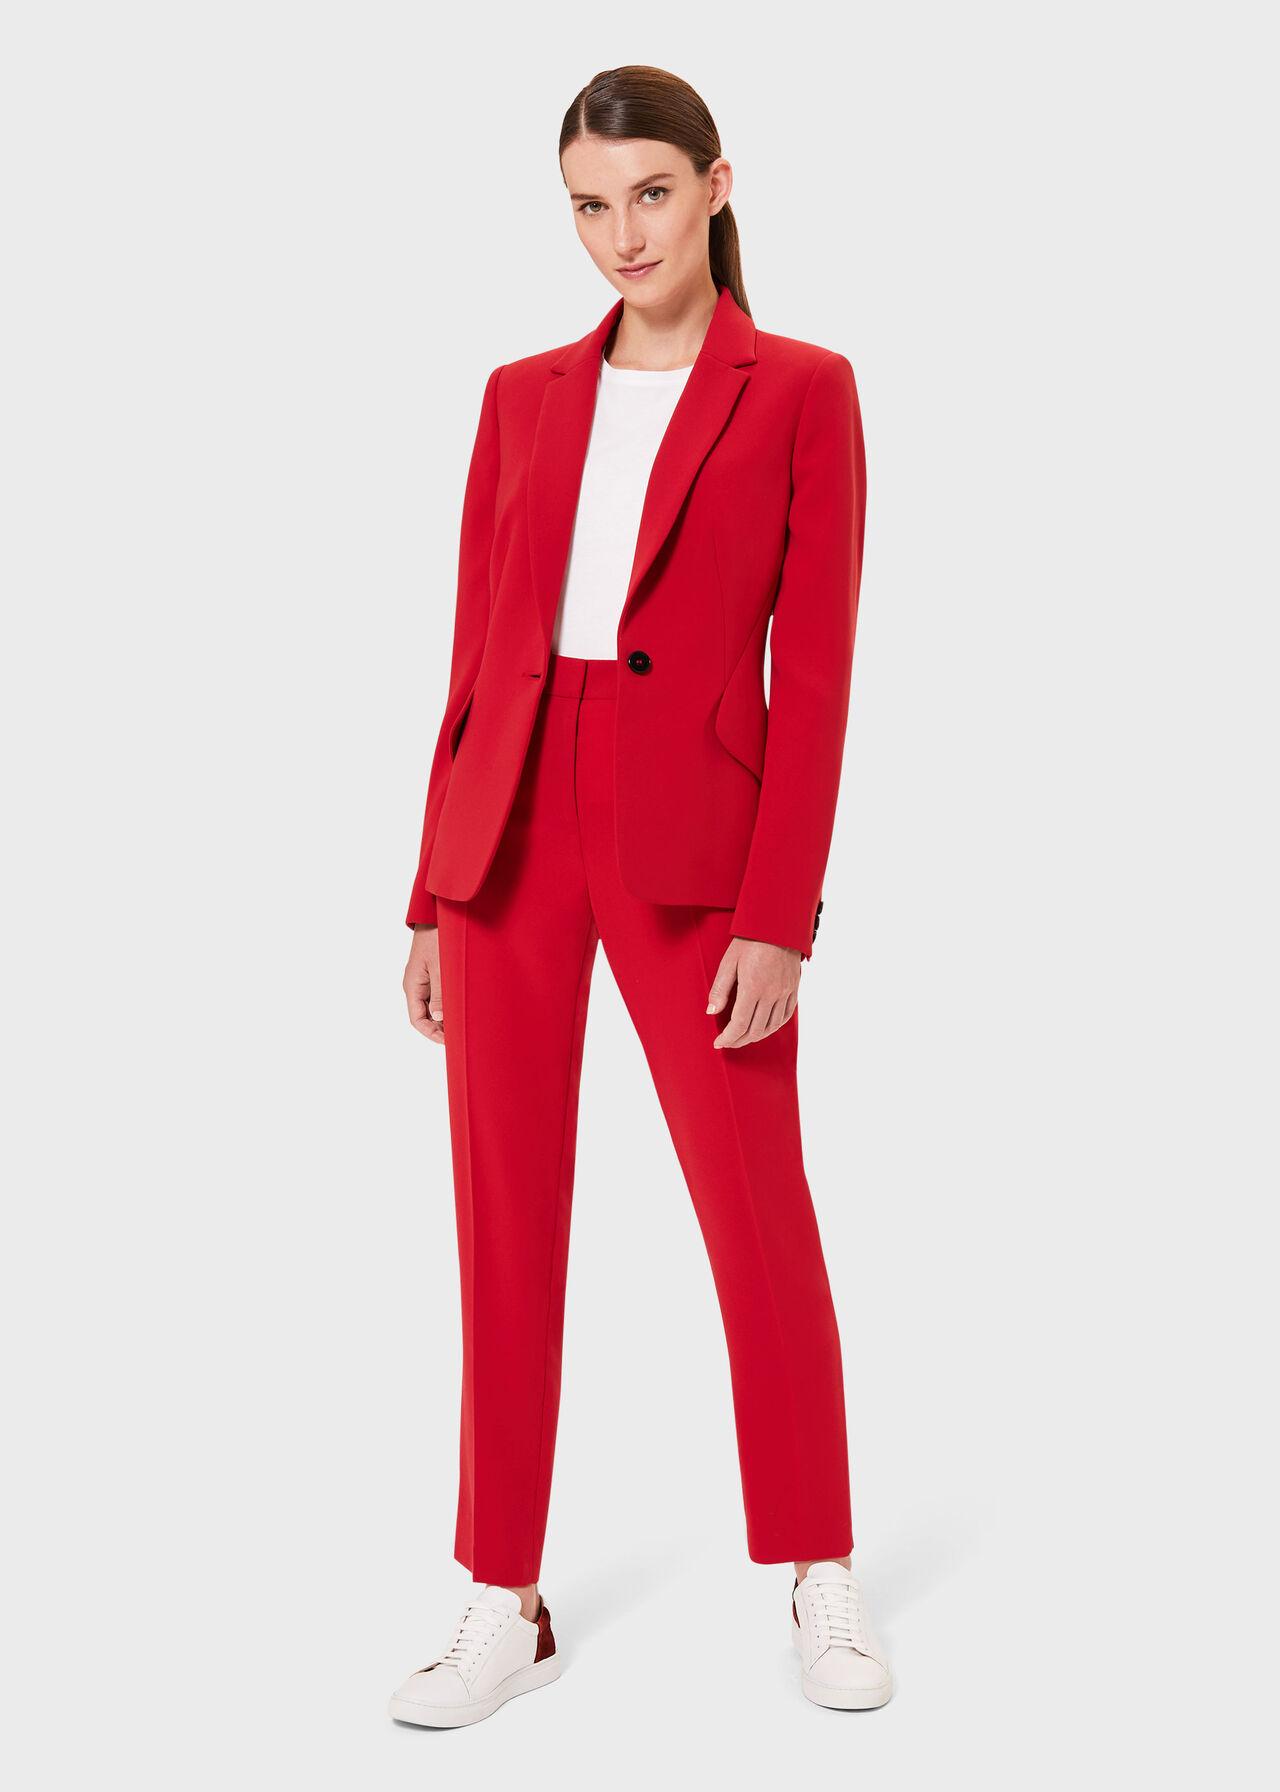 Zinnia Co-ord Trouser Suit, , hi-res